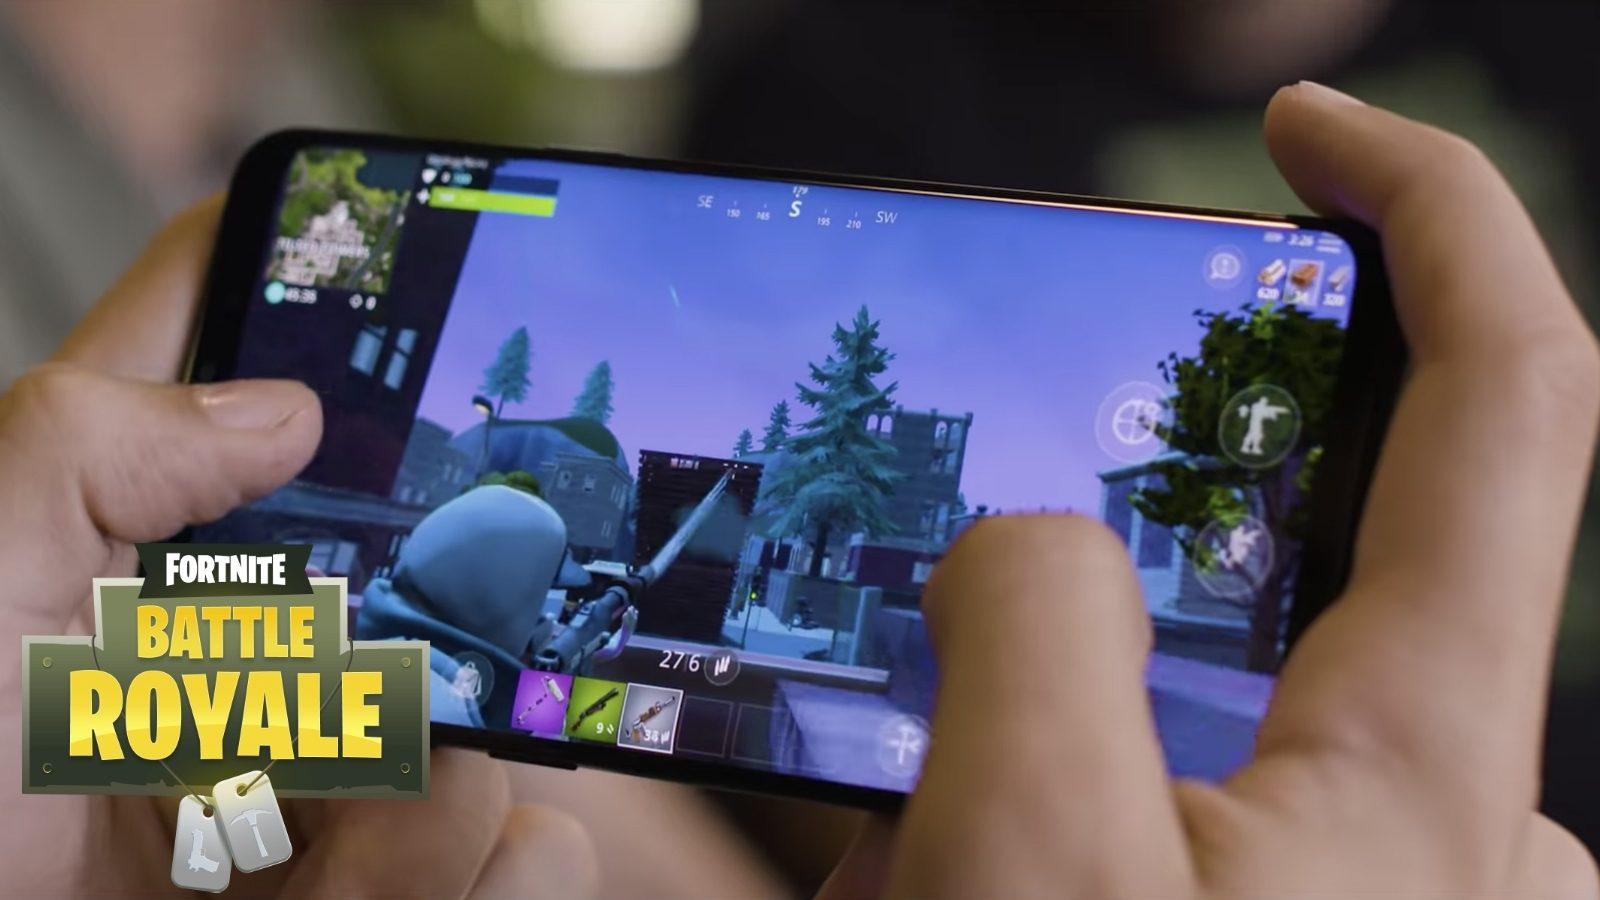 Samsung Fortnite aksesuar seti geliyor! SDN - 2